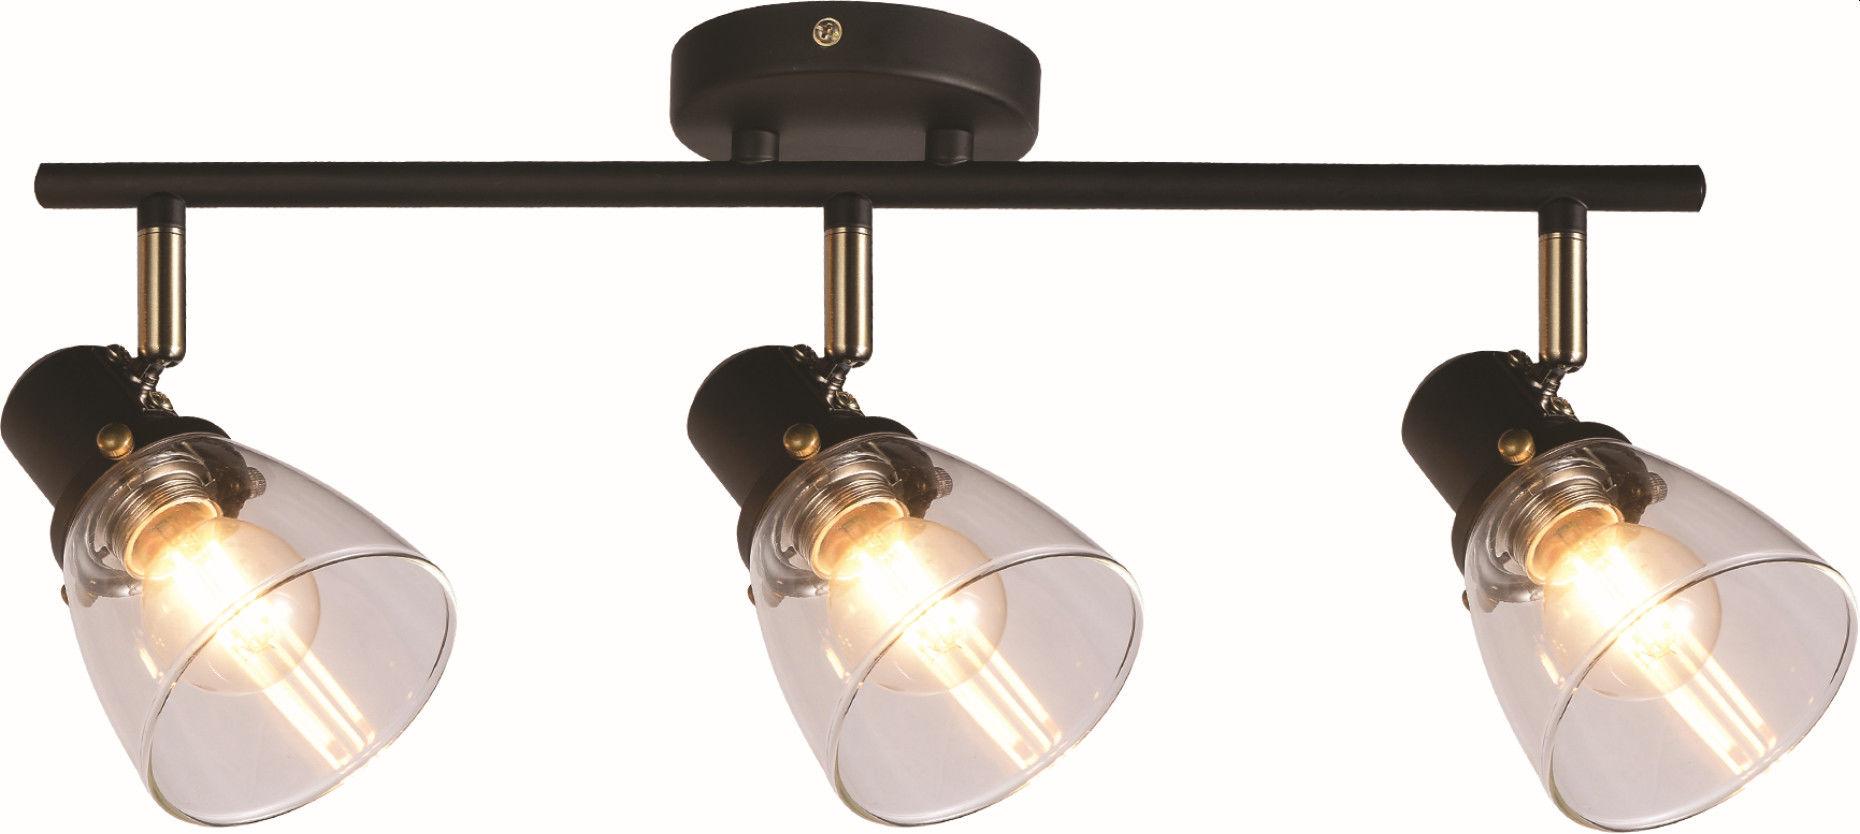 Kaja Elnis lampa sufitowa (spot) 2-punktowa K-8123